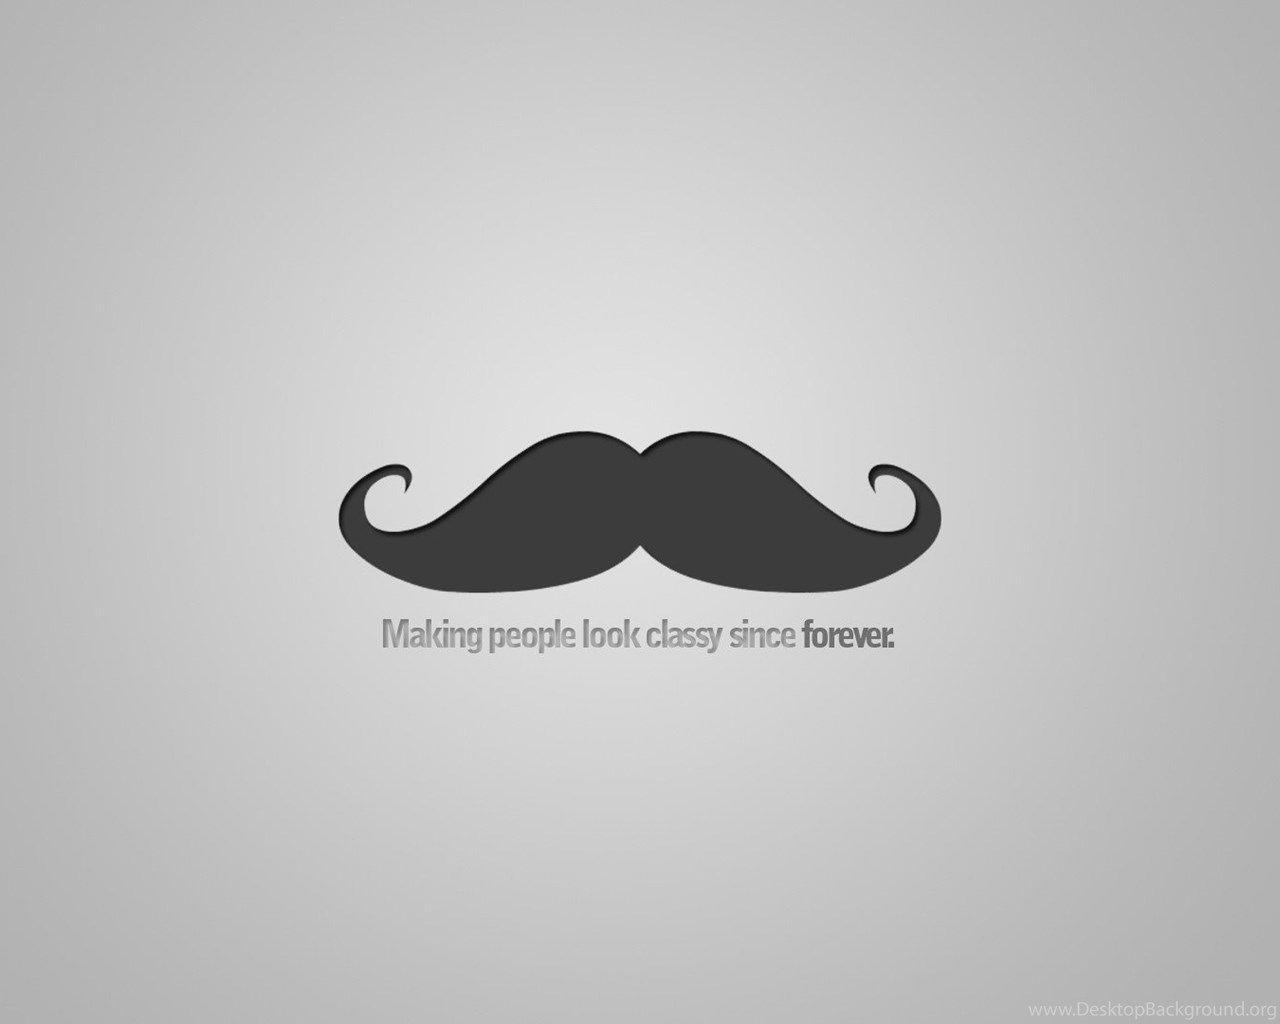 Moustache Wallpapers HD - Wallpaper Cave